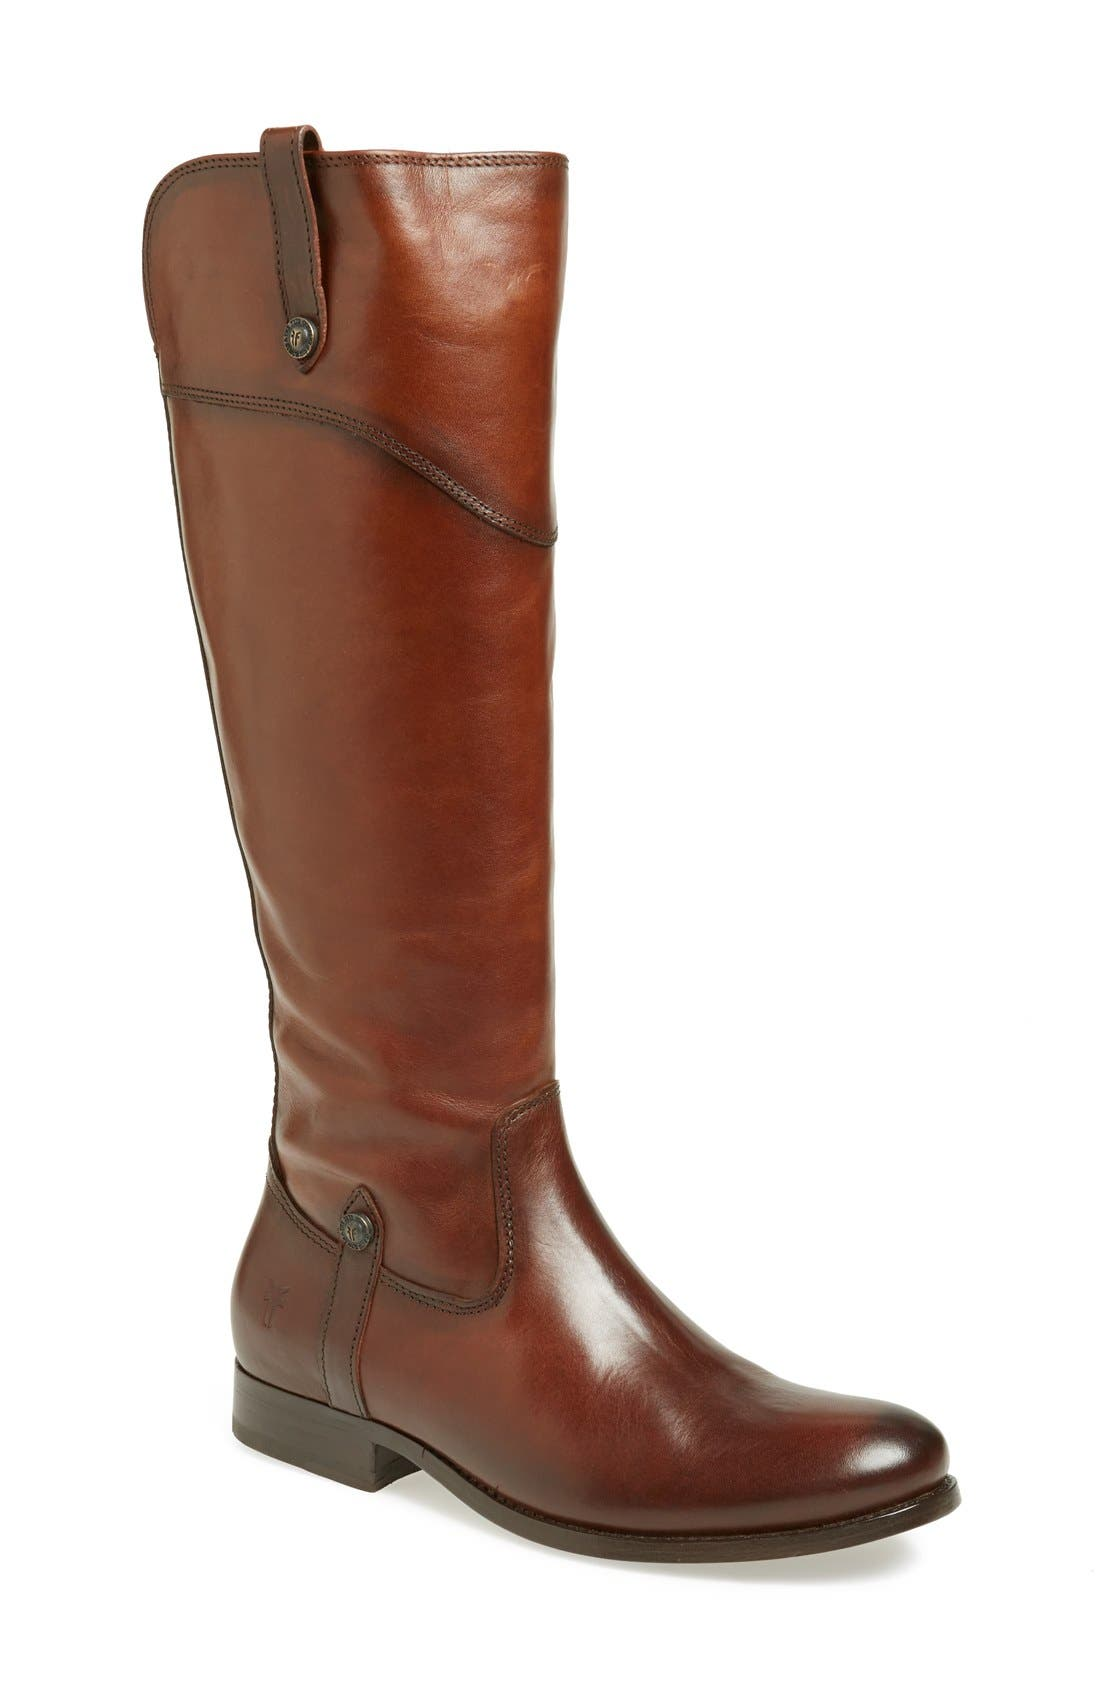 Alternate Image 1 Selected - Frye 'Melissa Tab' Knee High Boot (Women)